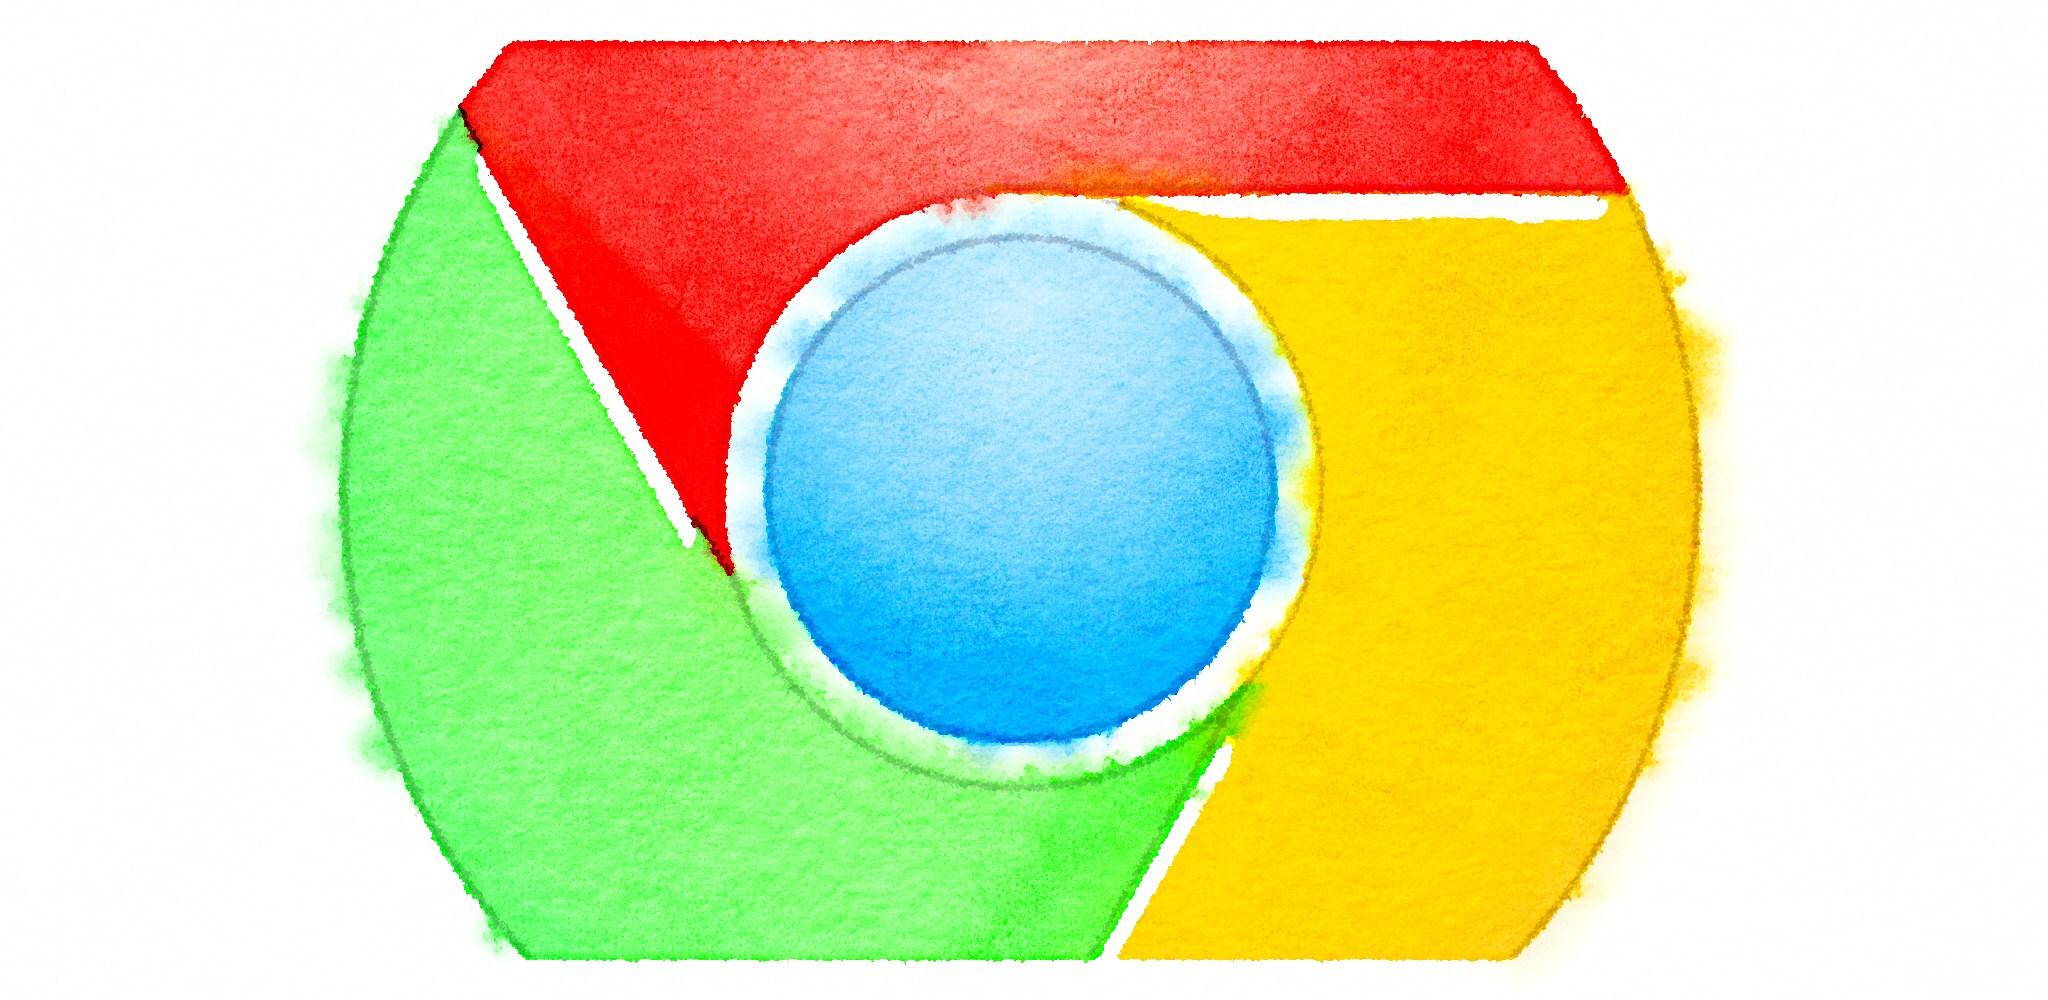 [Å] ブログカスタマイズに便利なツール、Chromeの「要素の検証」の使い方をご紹介!